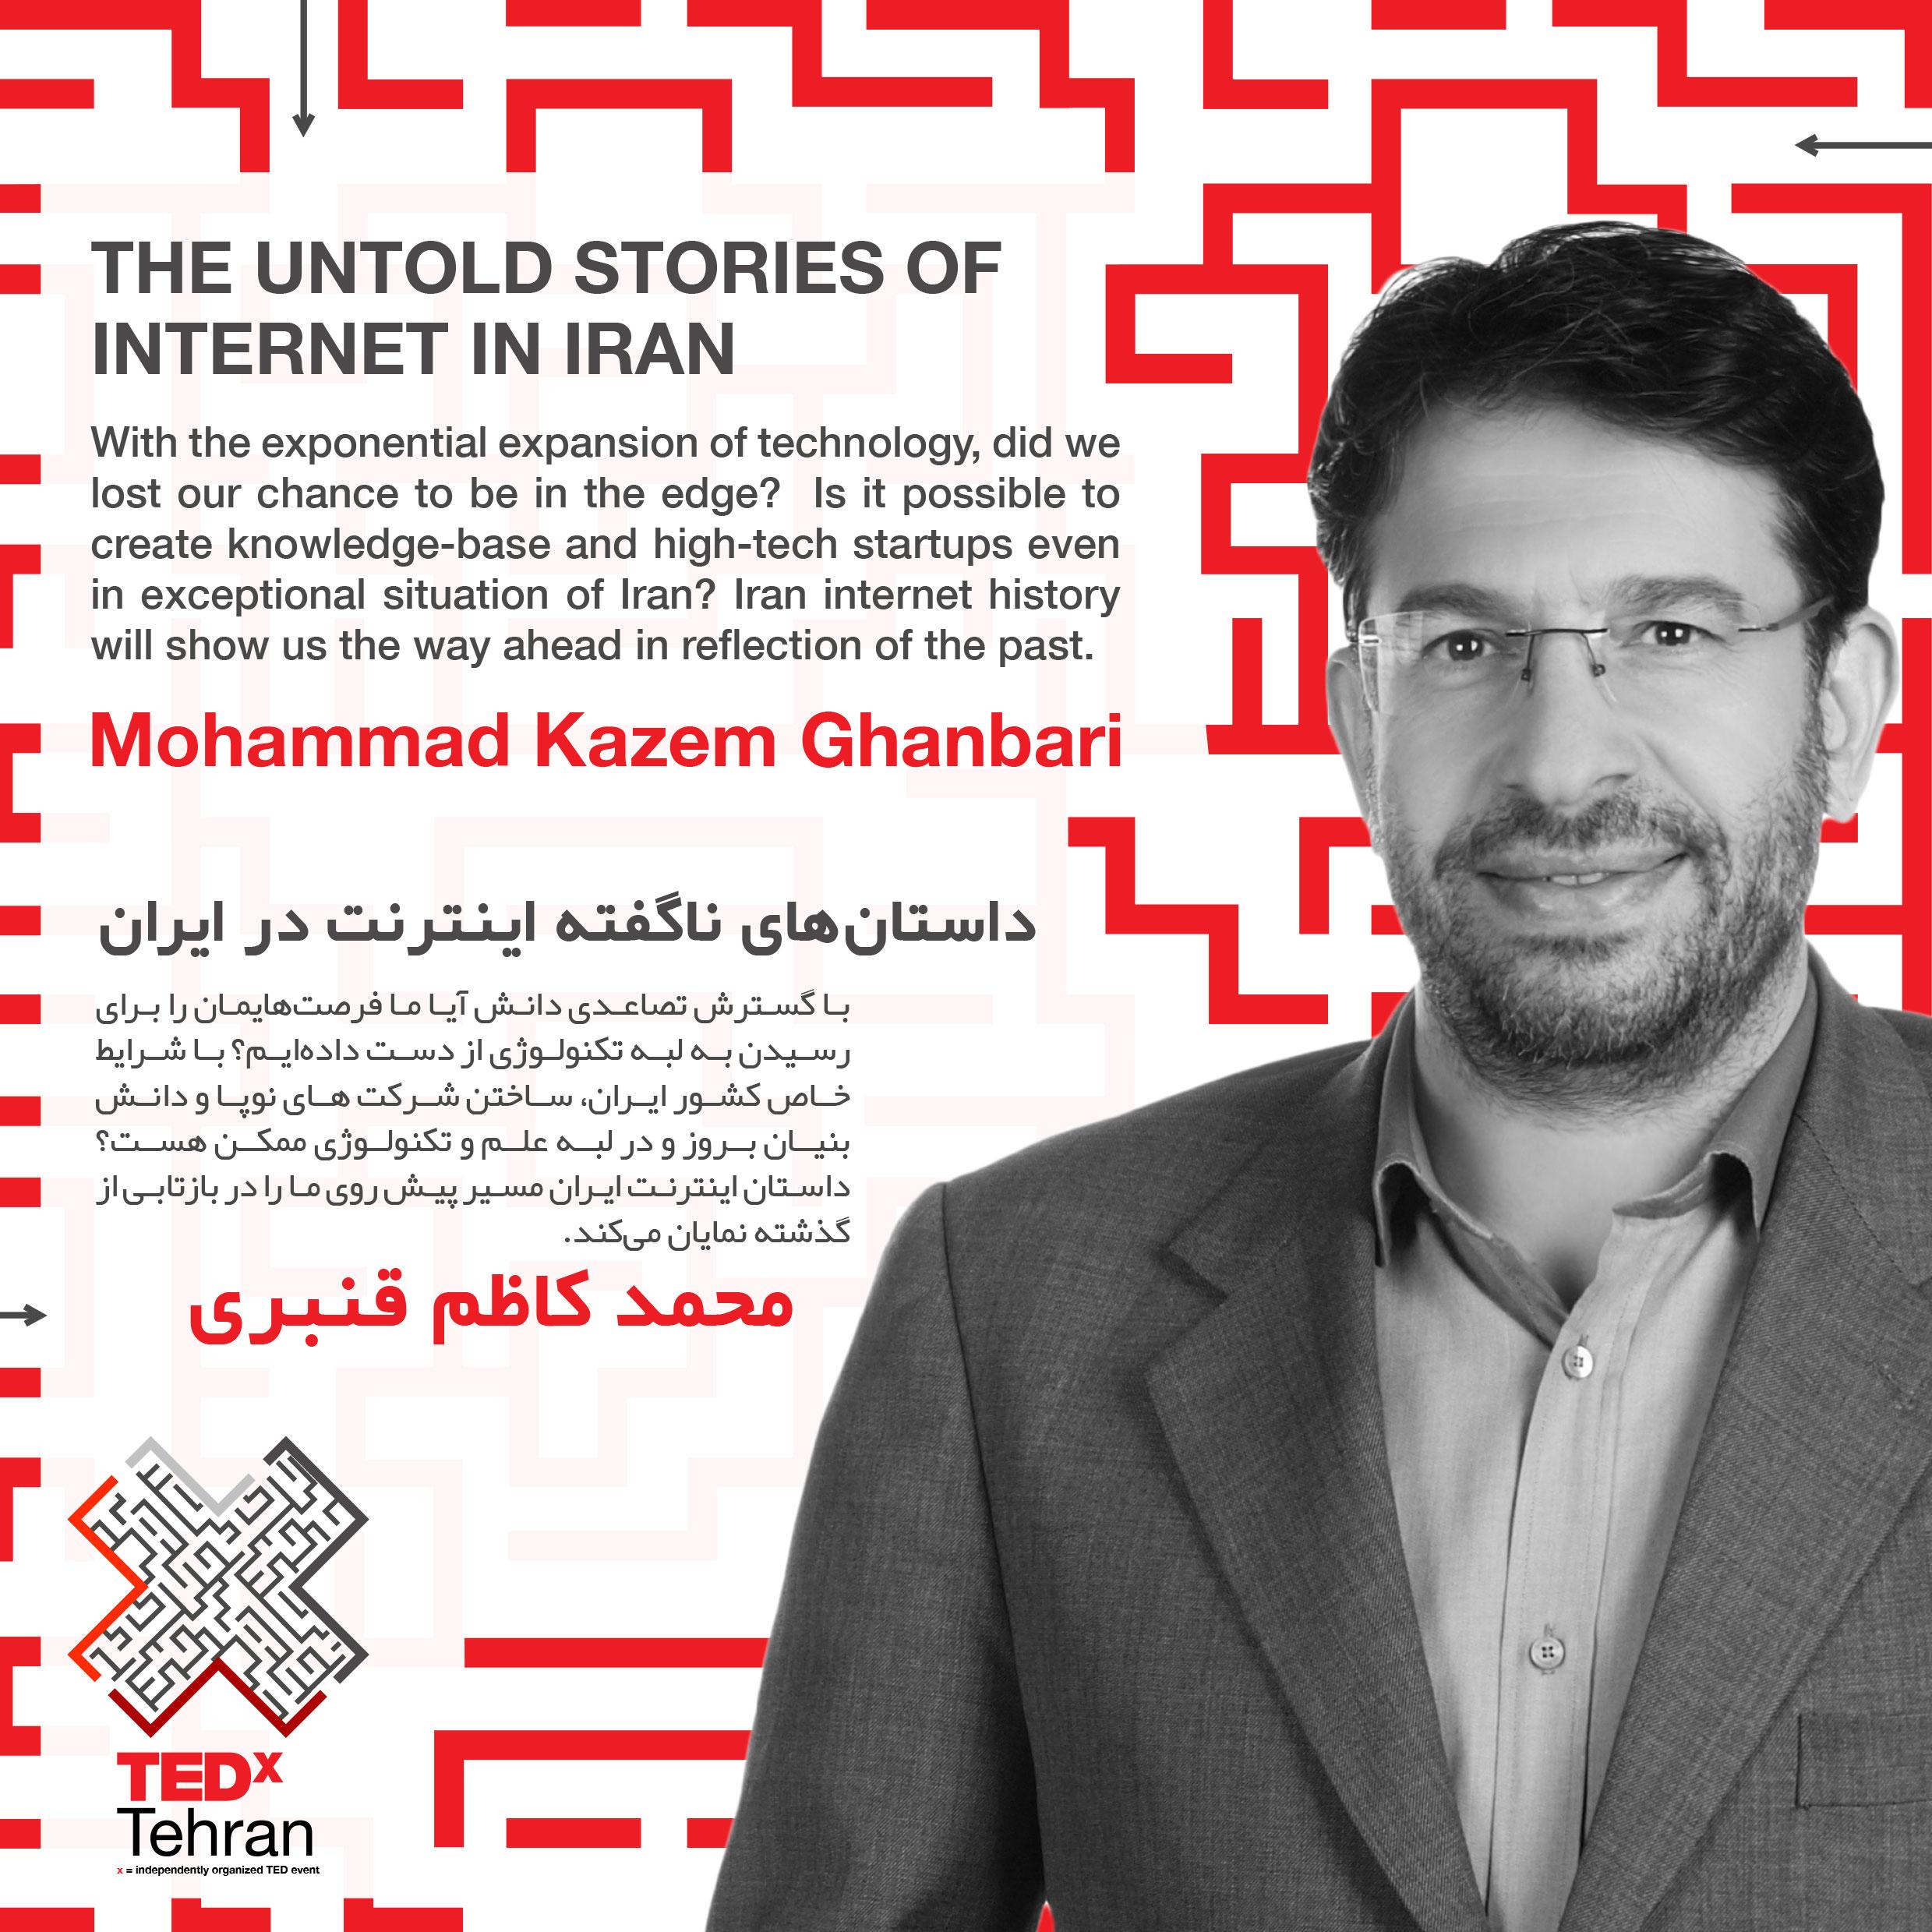 Mohammad Kazem Ghanbari